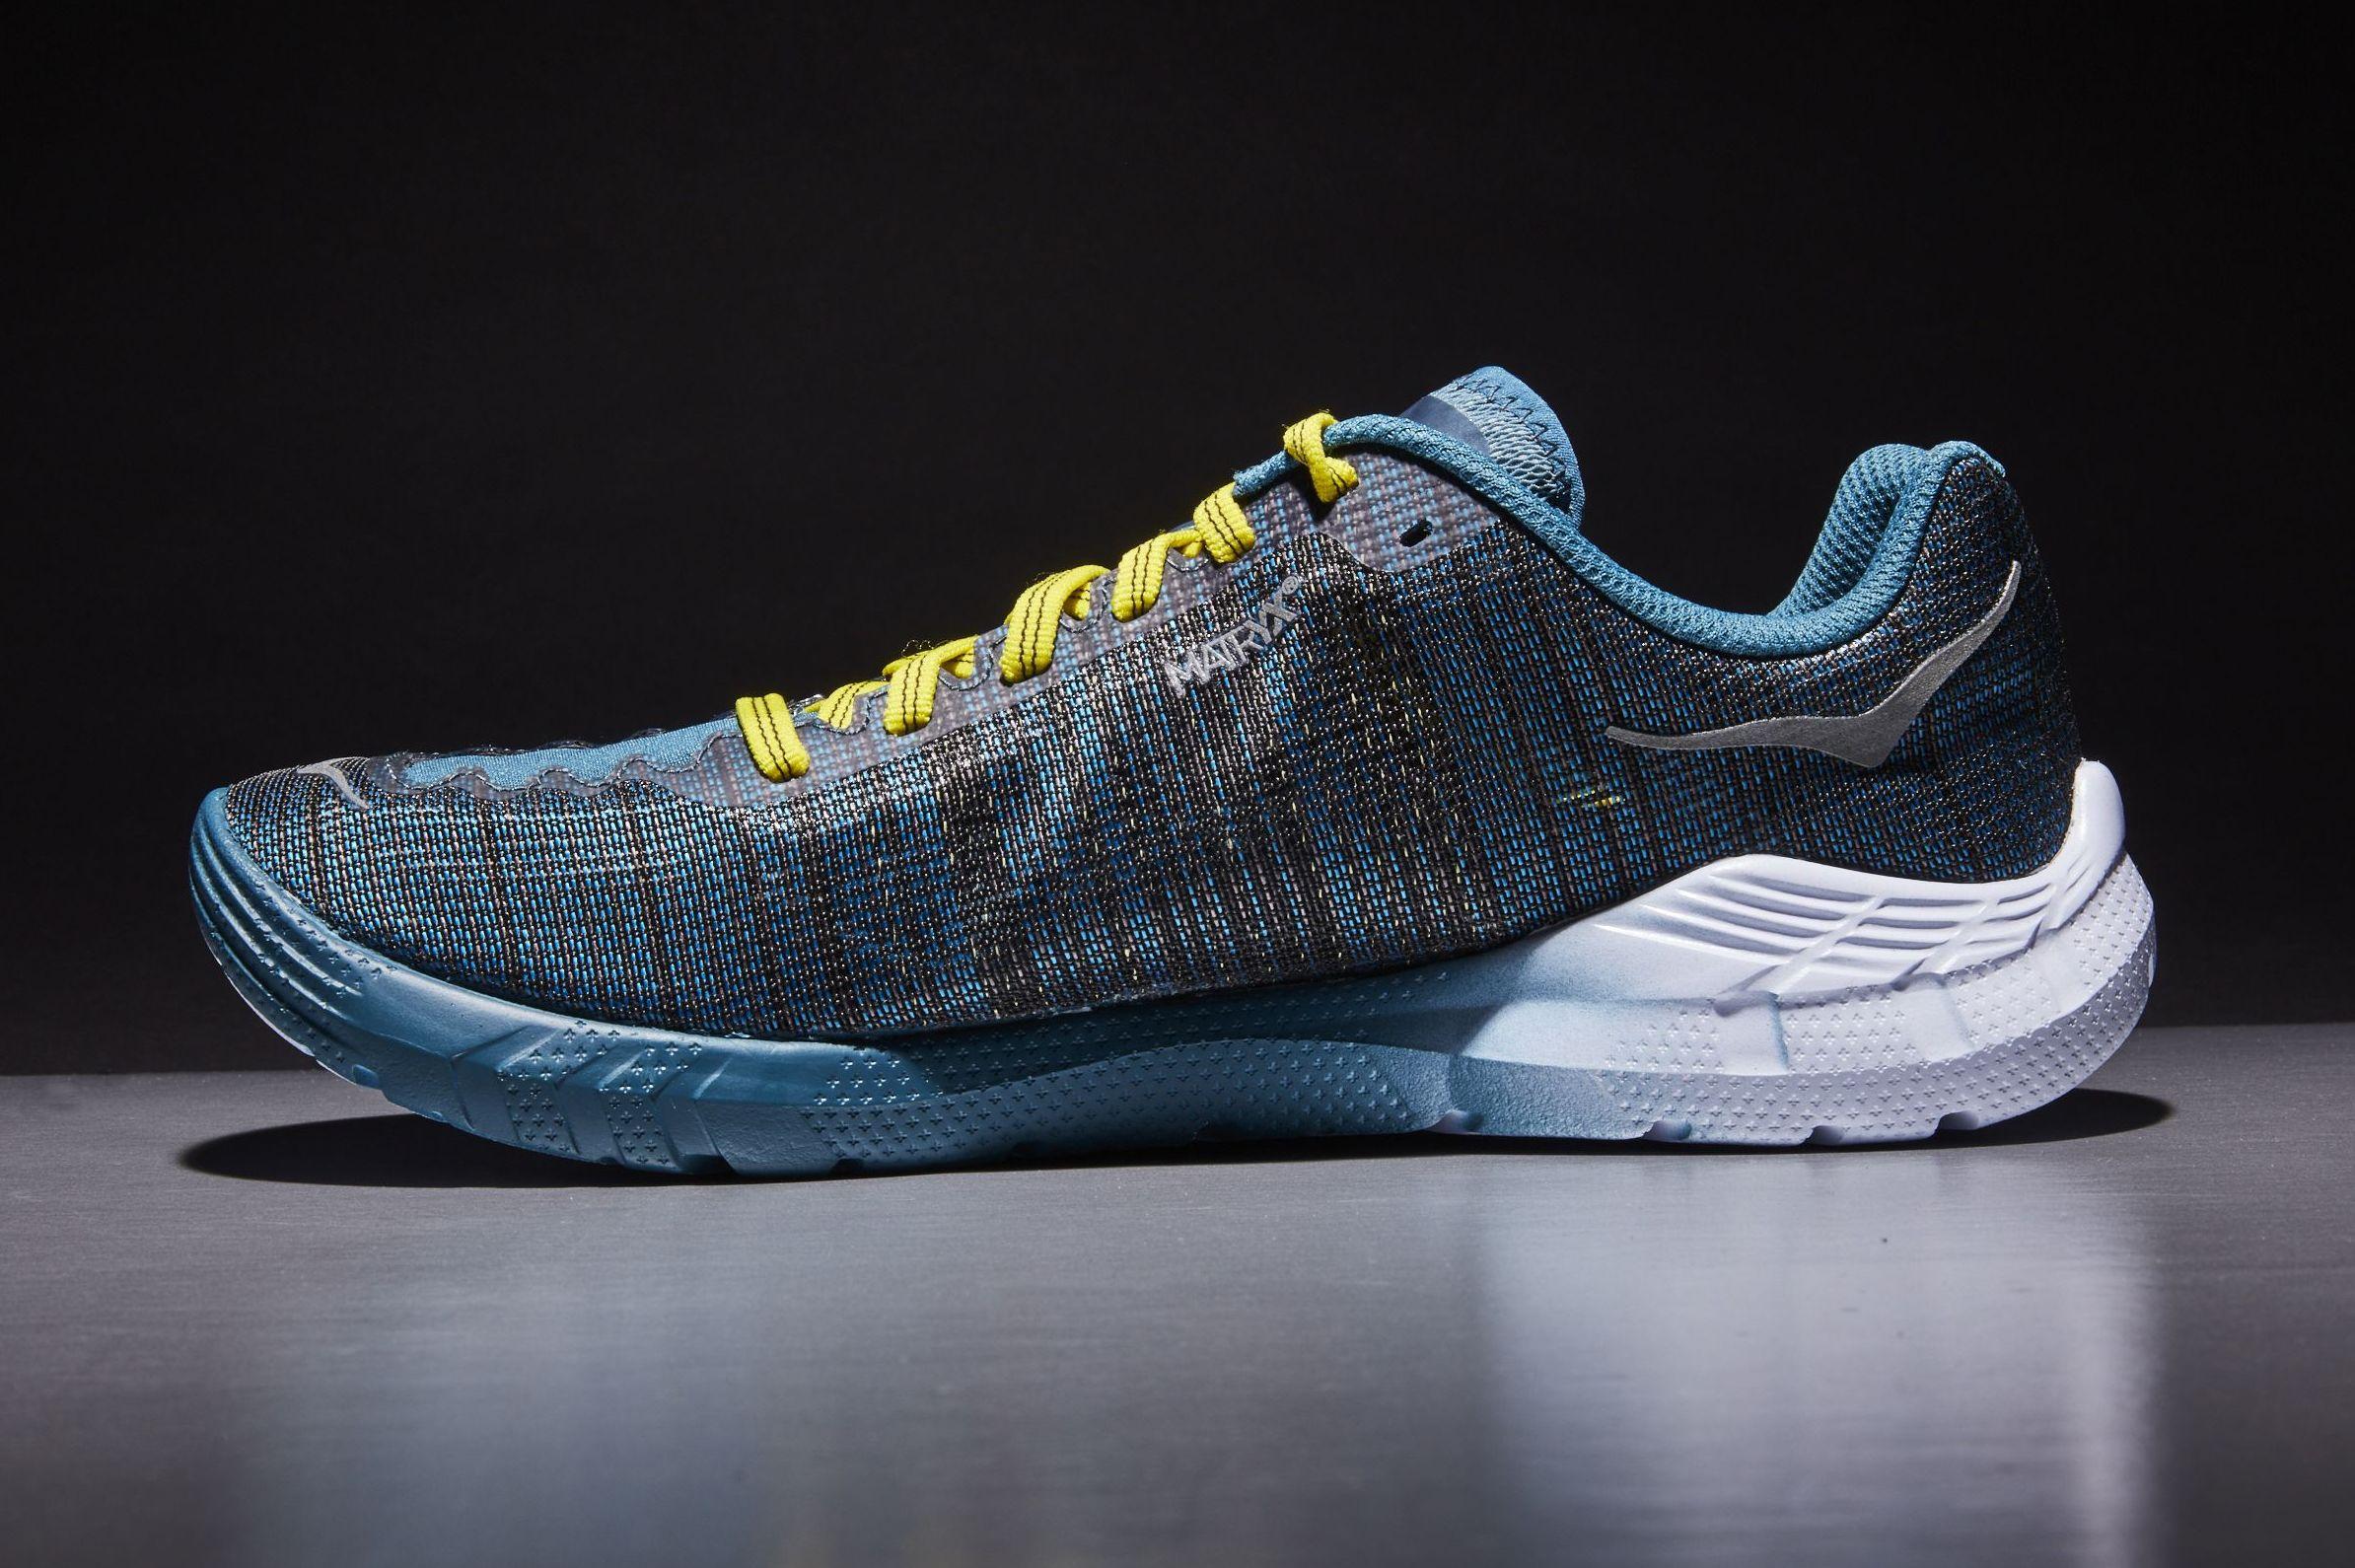 separation shoes 52e80 eef1c Hoka Running Shoes 2019   14 Best Hoka One One Shoes